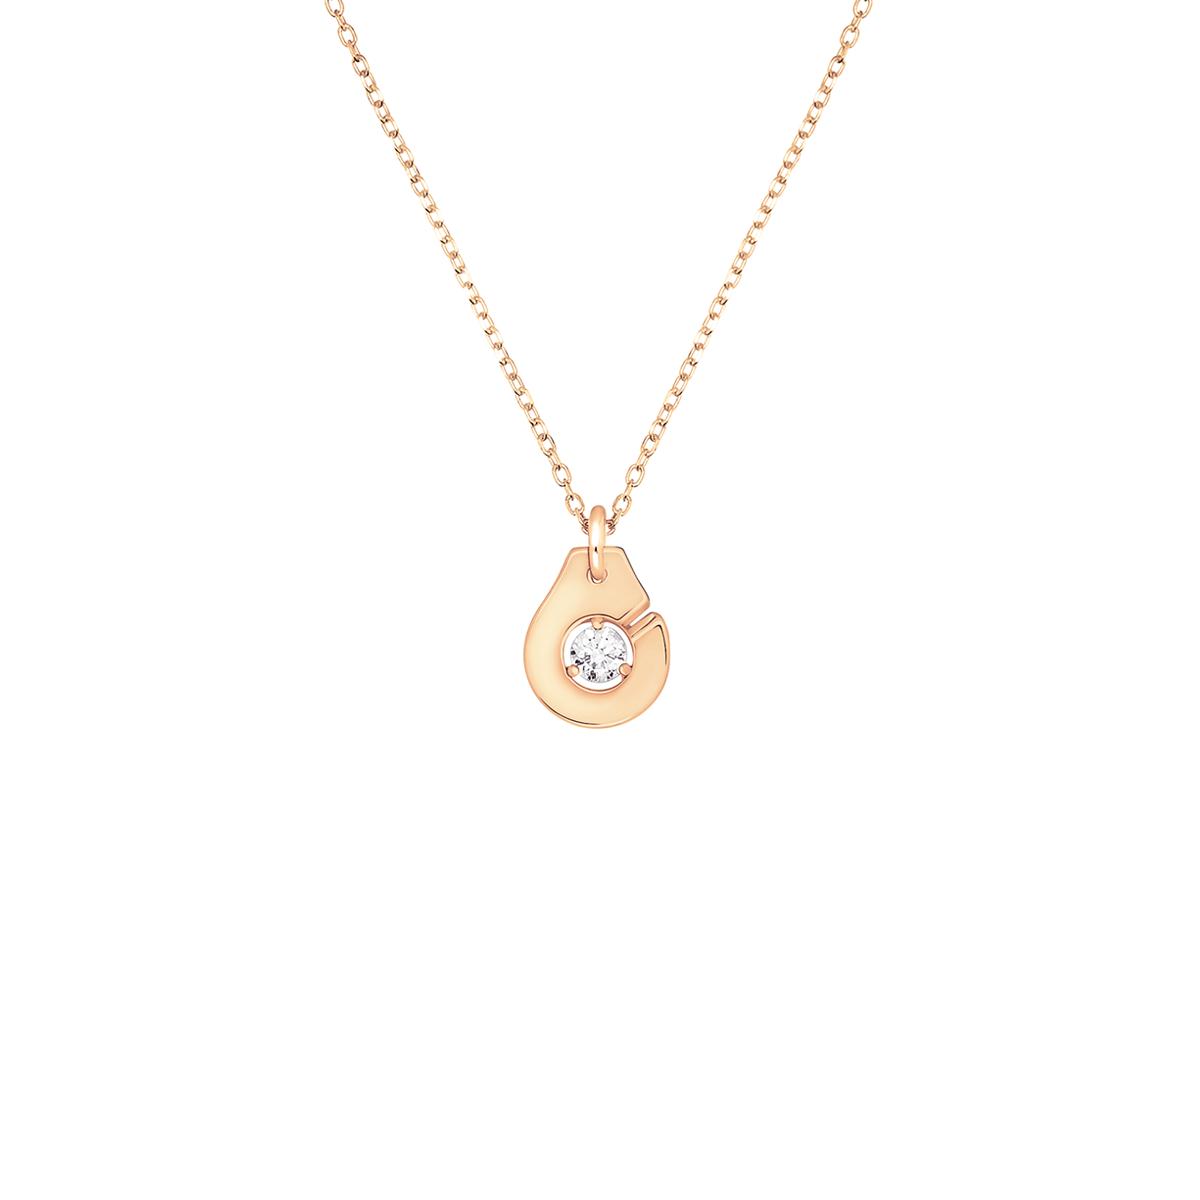 Collier Menottes dinh van R8 or rose et diamant